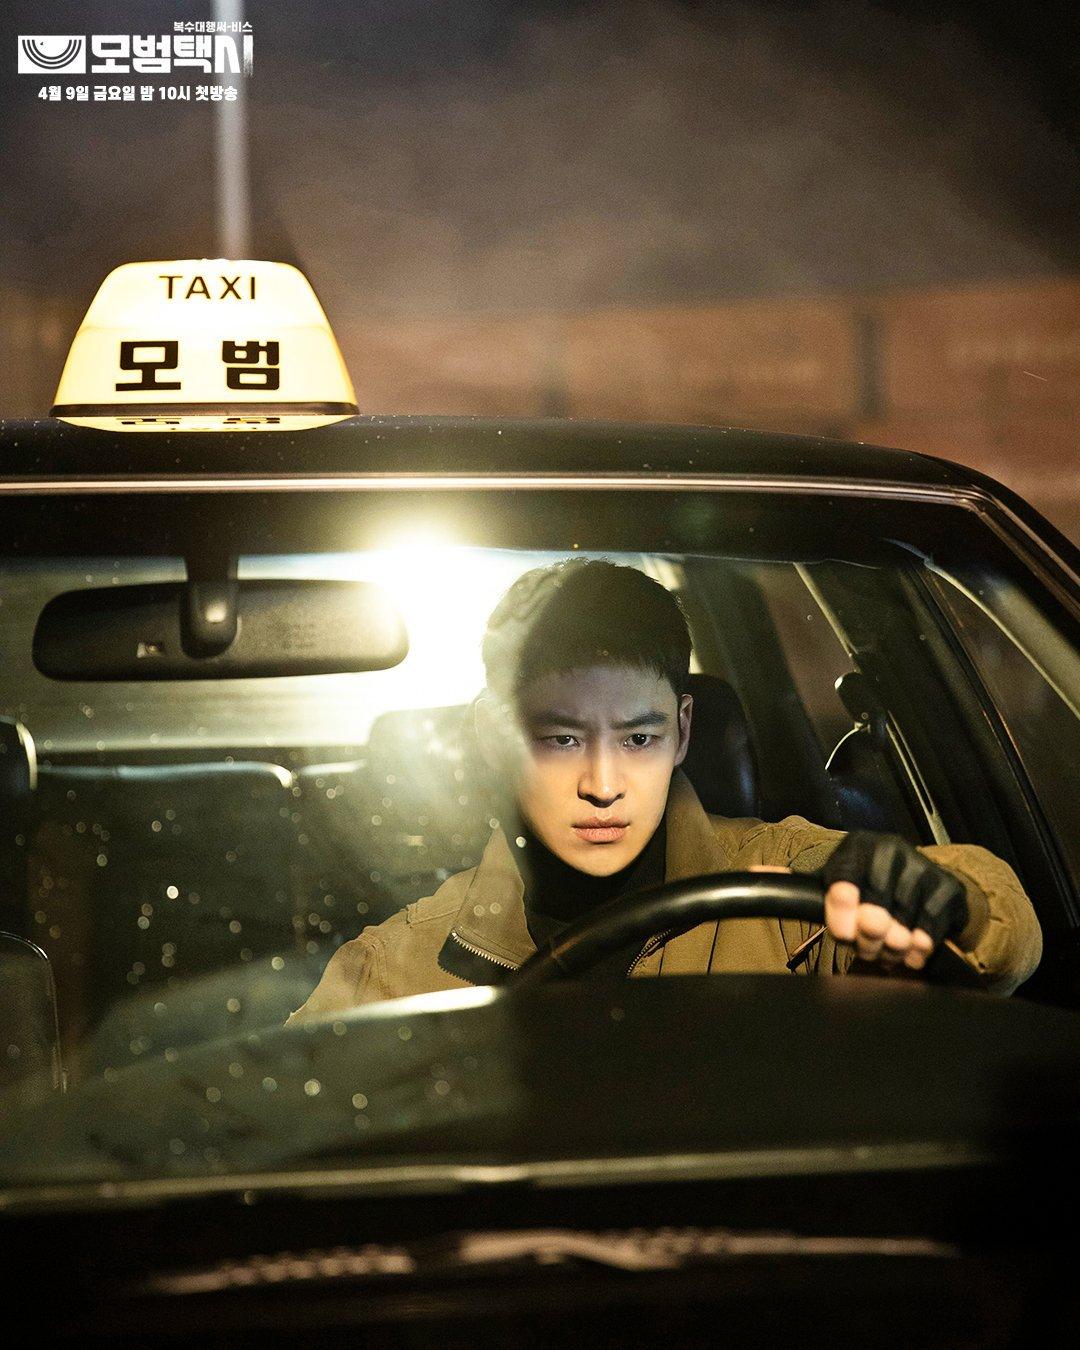 taxi driver1